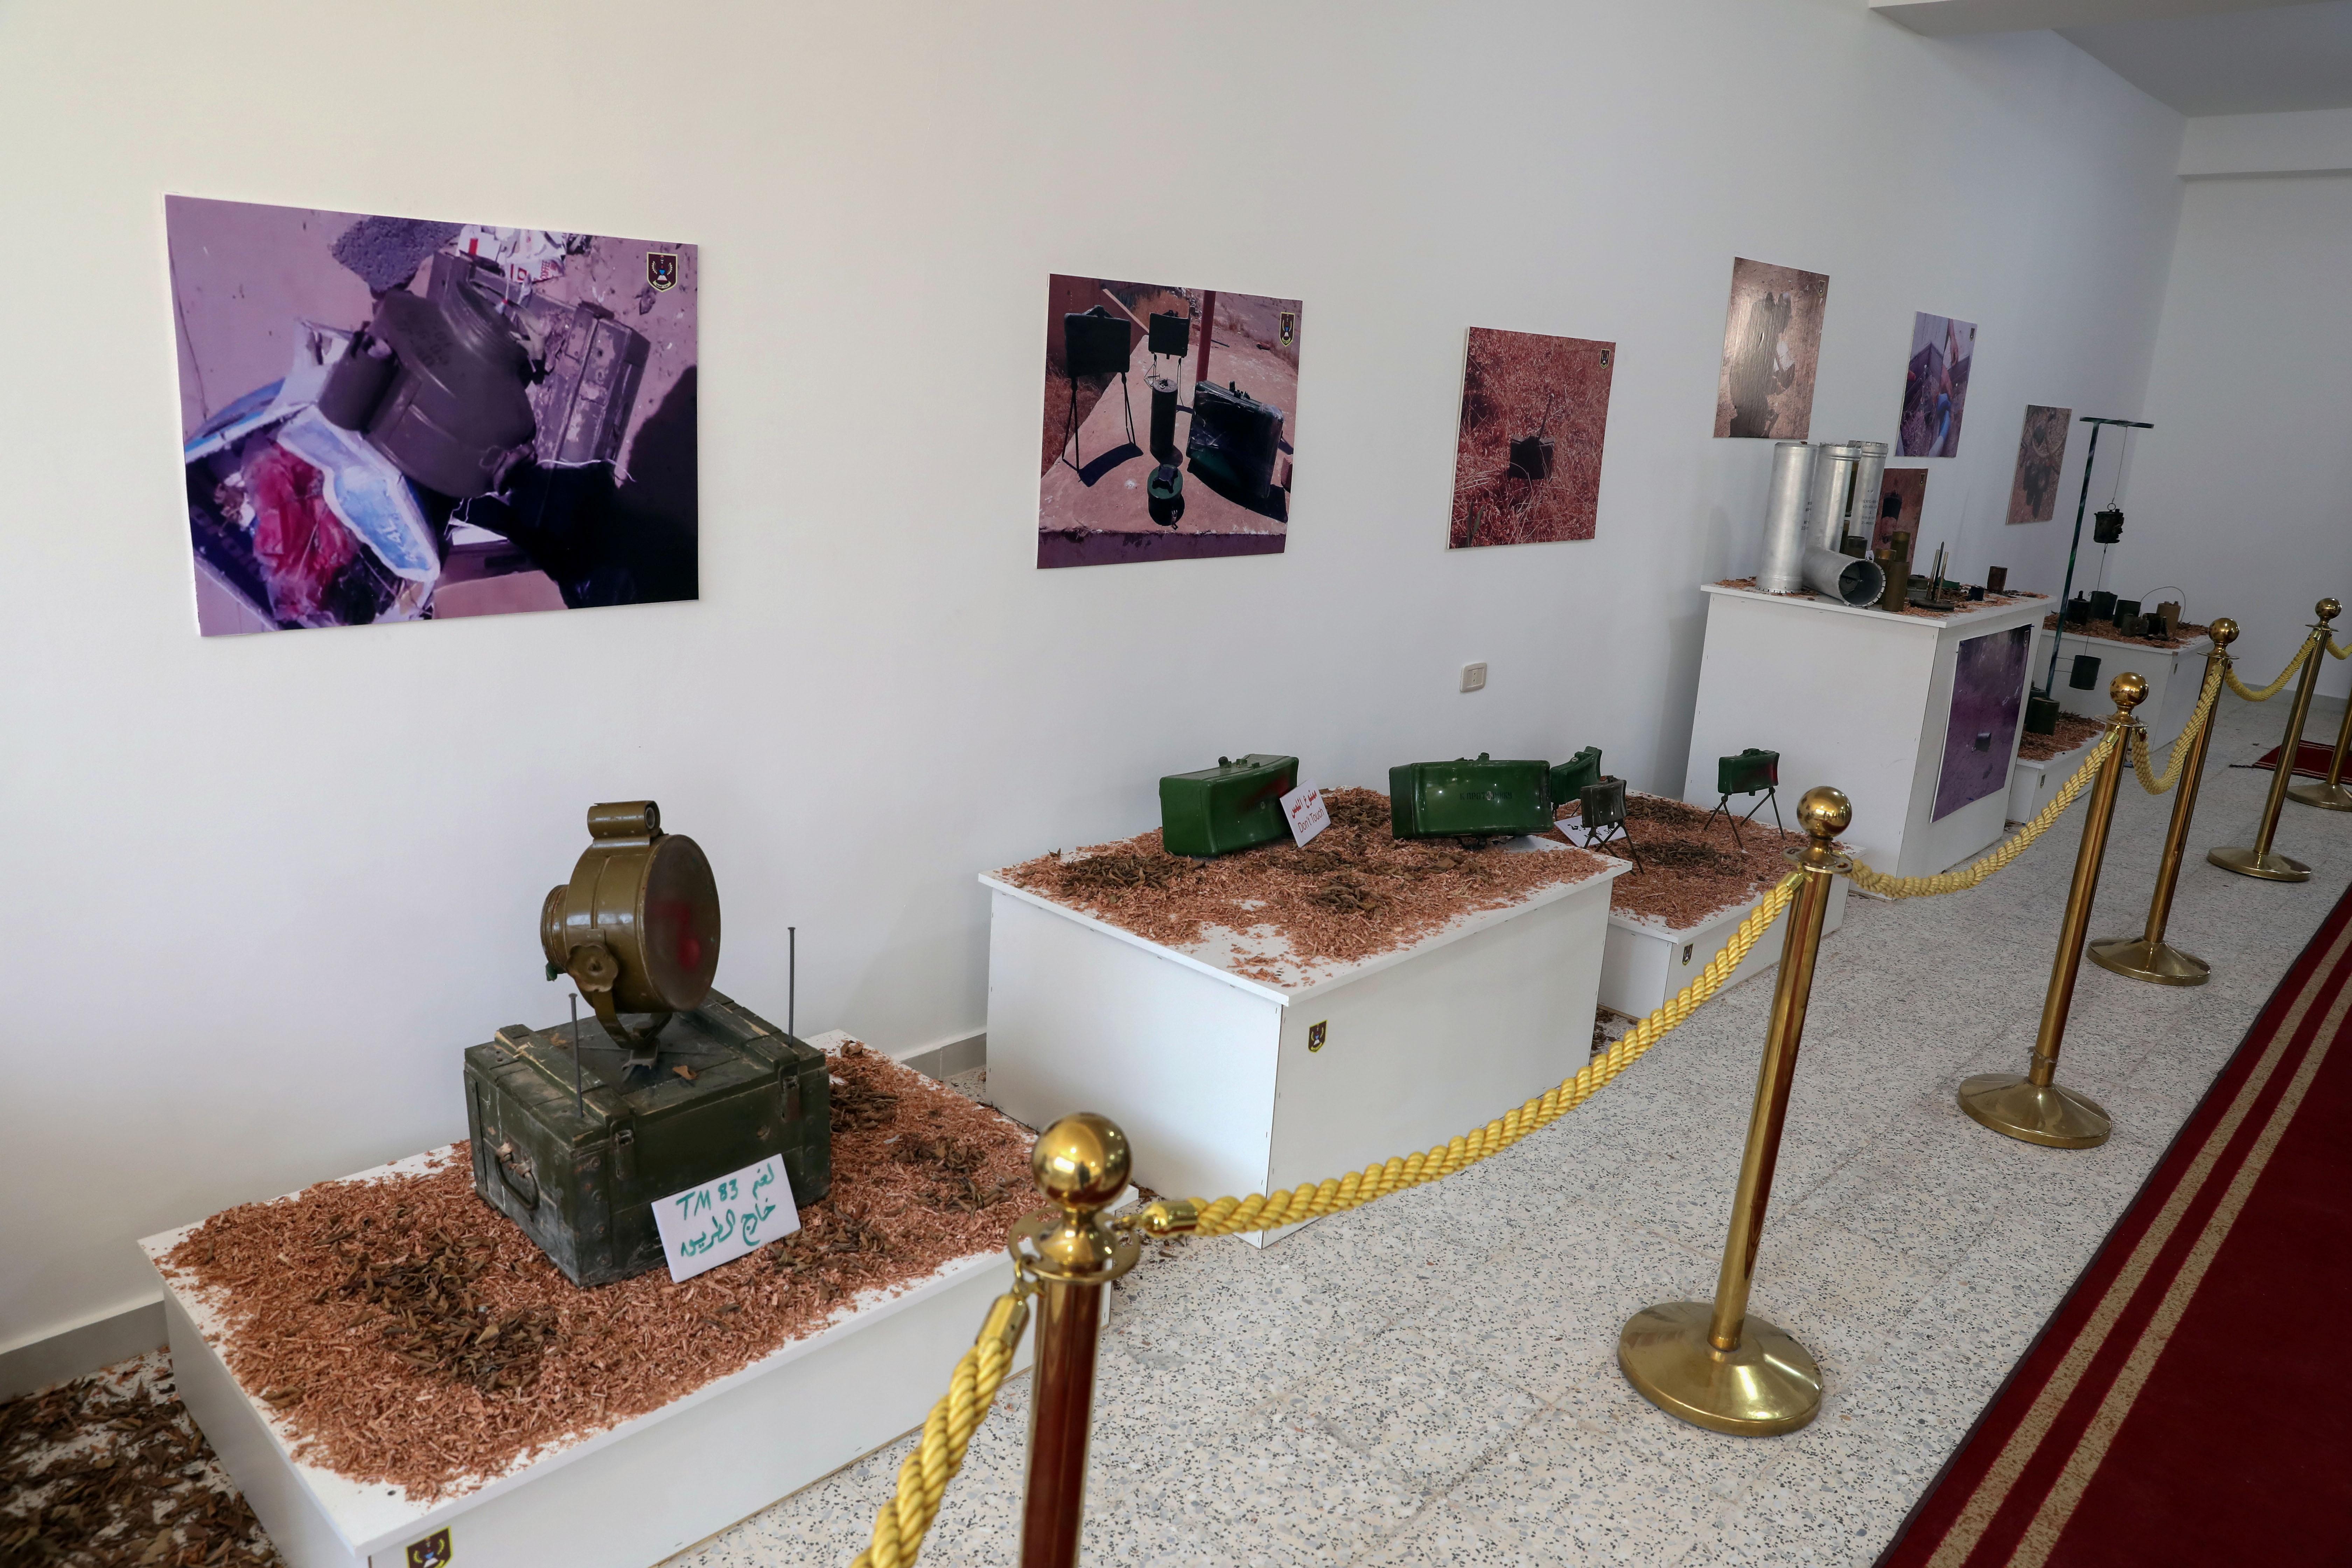 Mines are displayed at a military exhibiton inTripoli, Libya, July 9, 2020. REUTERS/Hazem Ahmed